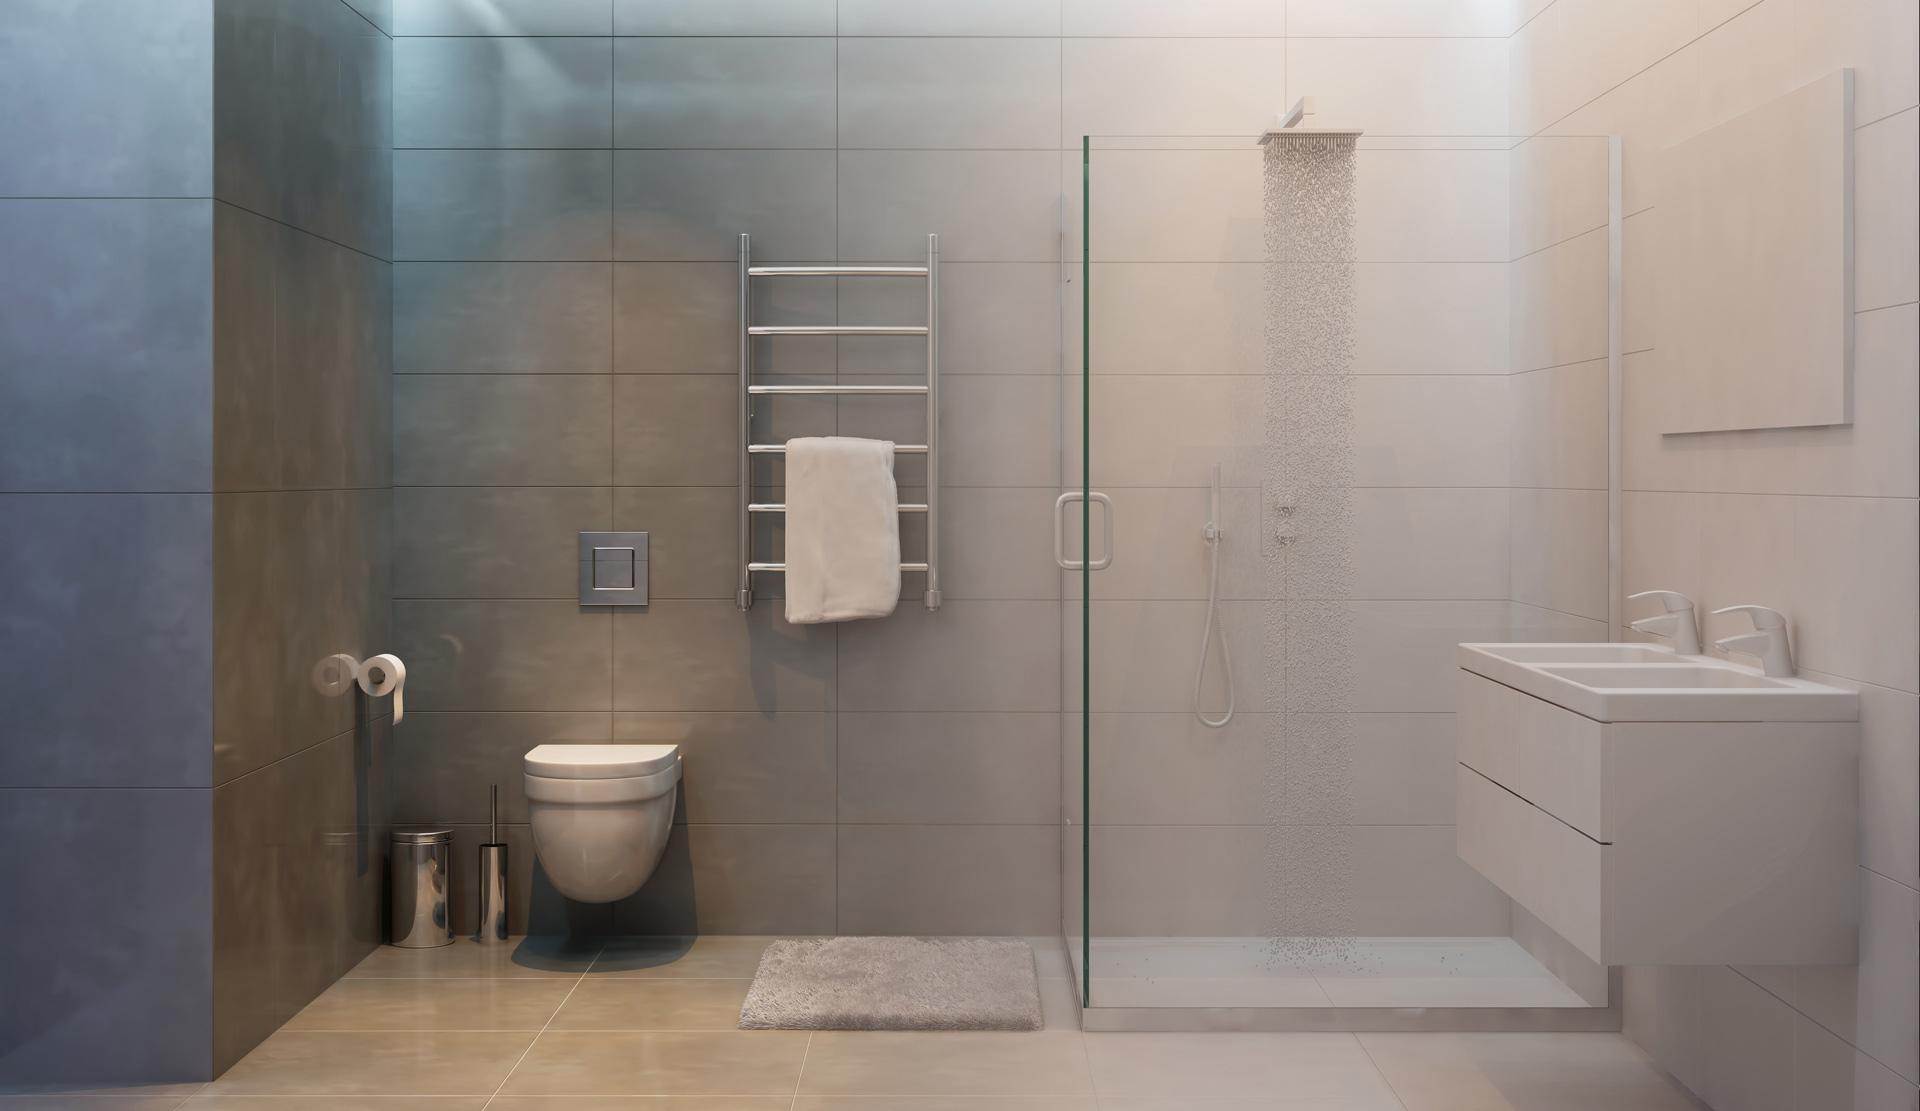 relooking-salle-bains-3jours